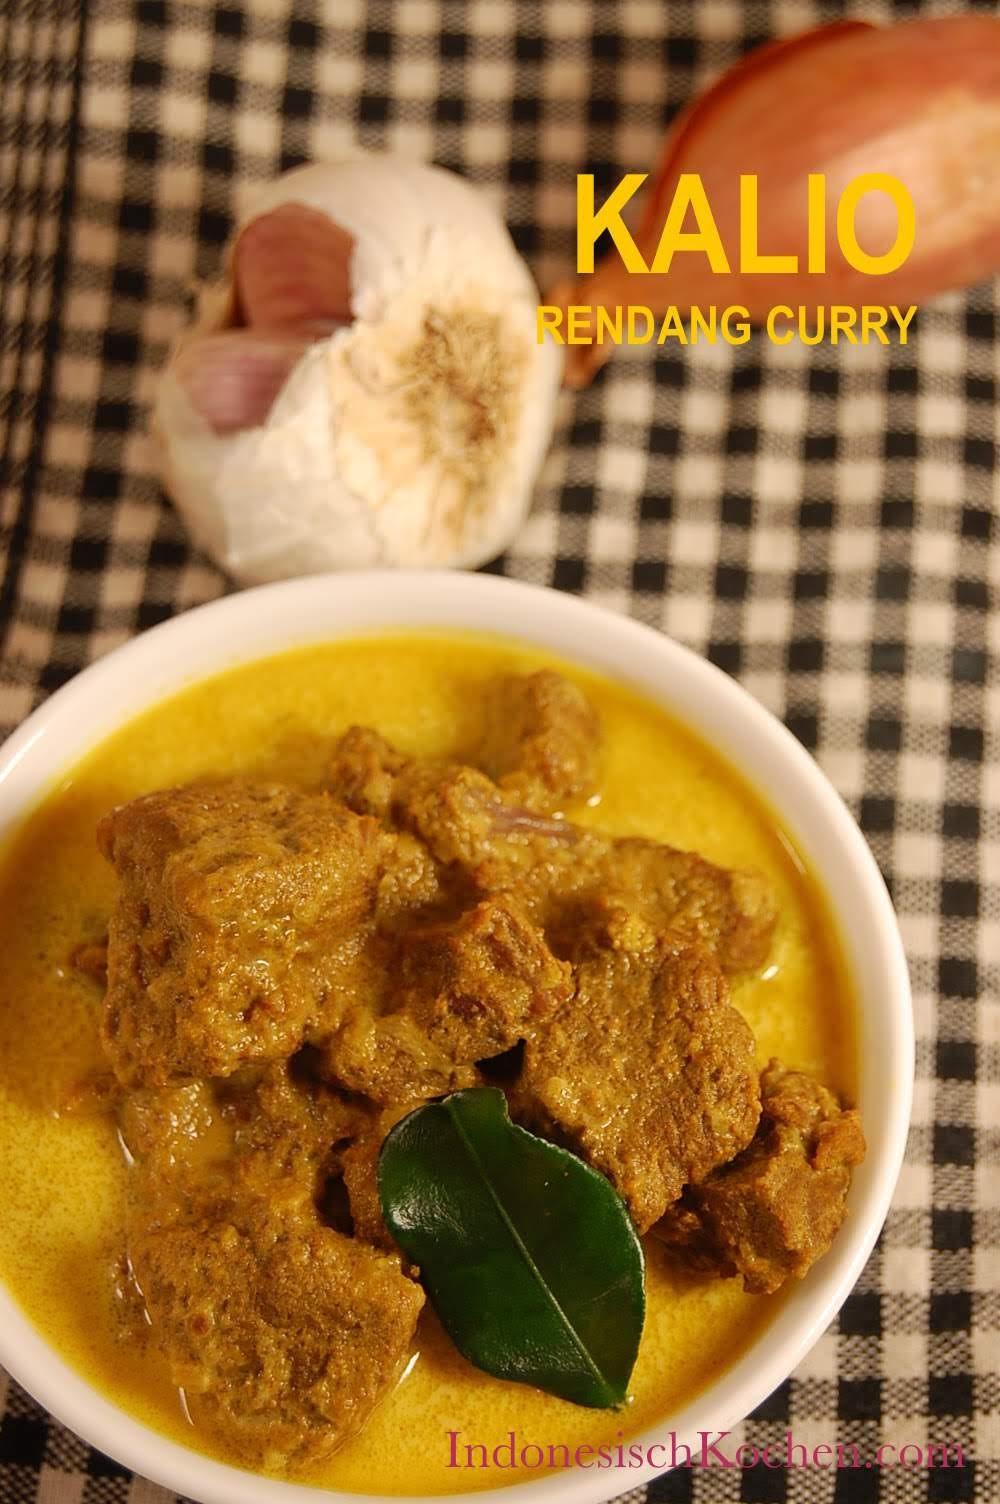 Rezept Kalio, Rendang Curry